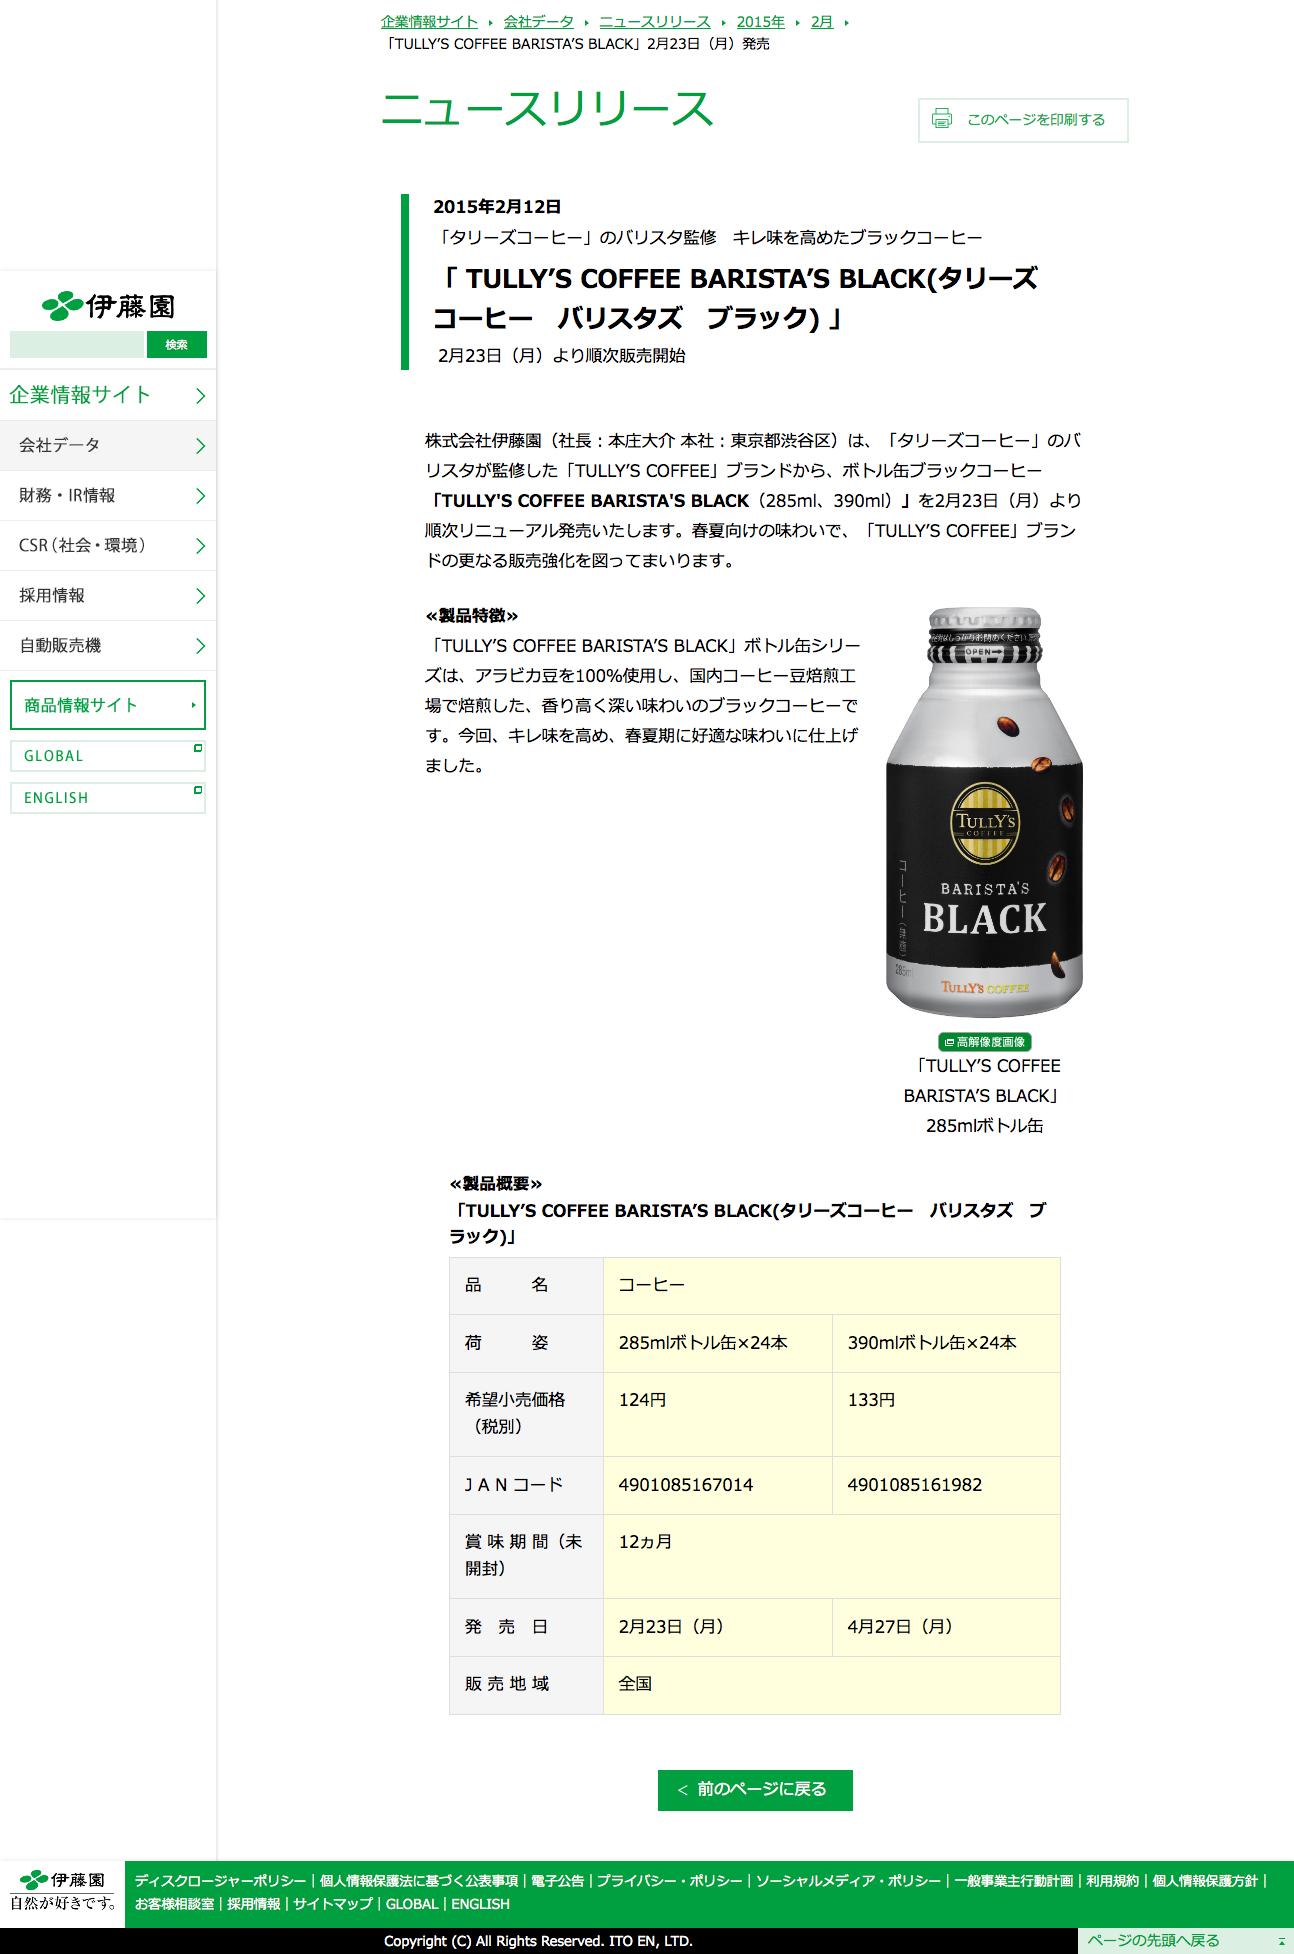 「TULLY'S COFFEE BARISTA'S BLACK」2月23日(月)発売  ニュースリリース  伊藤園